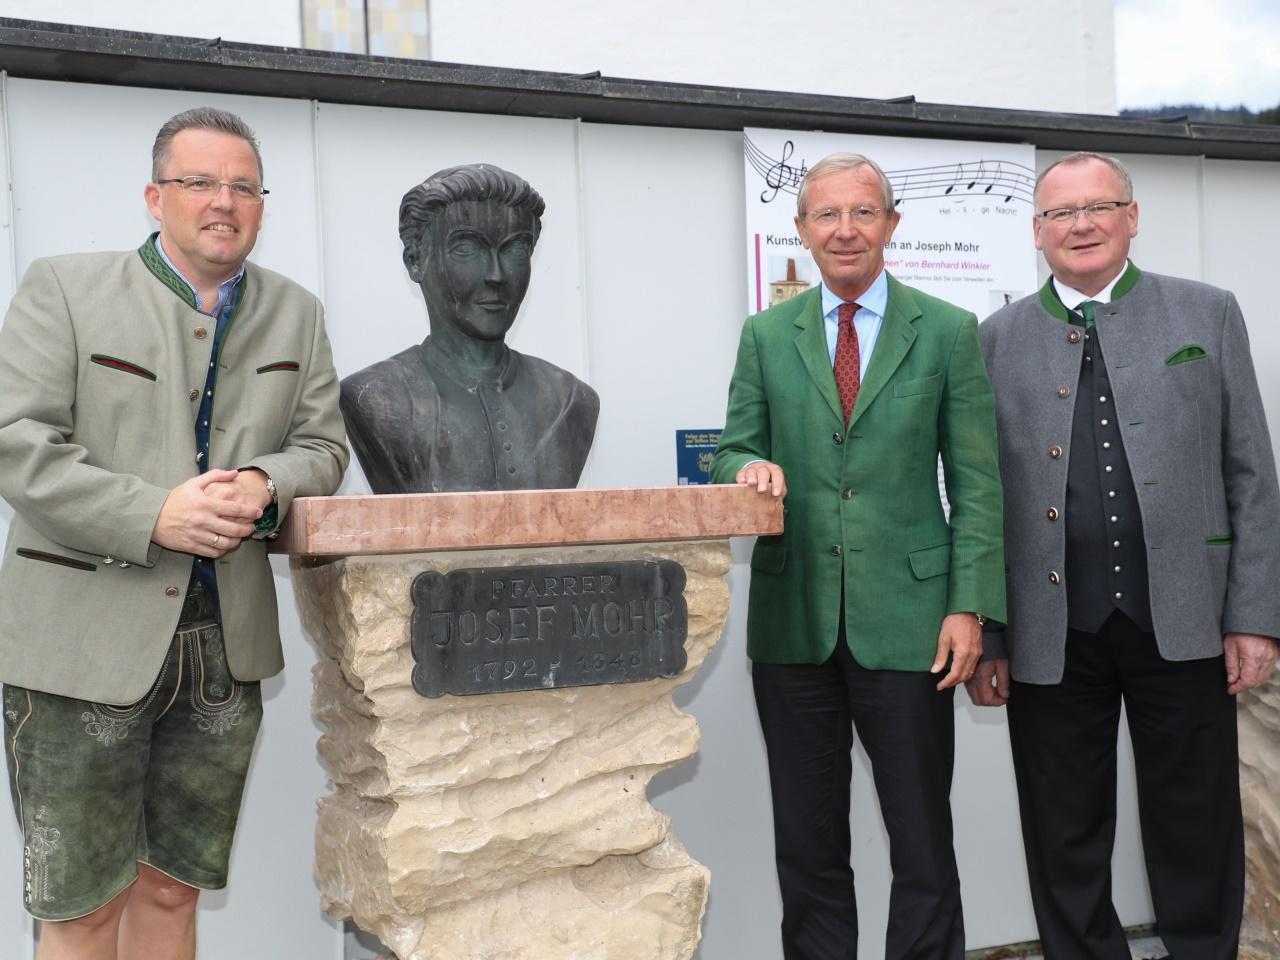 Joseph-Moor-Gedenkweg in Hintersee eröffnet